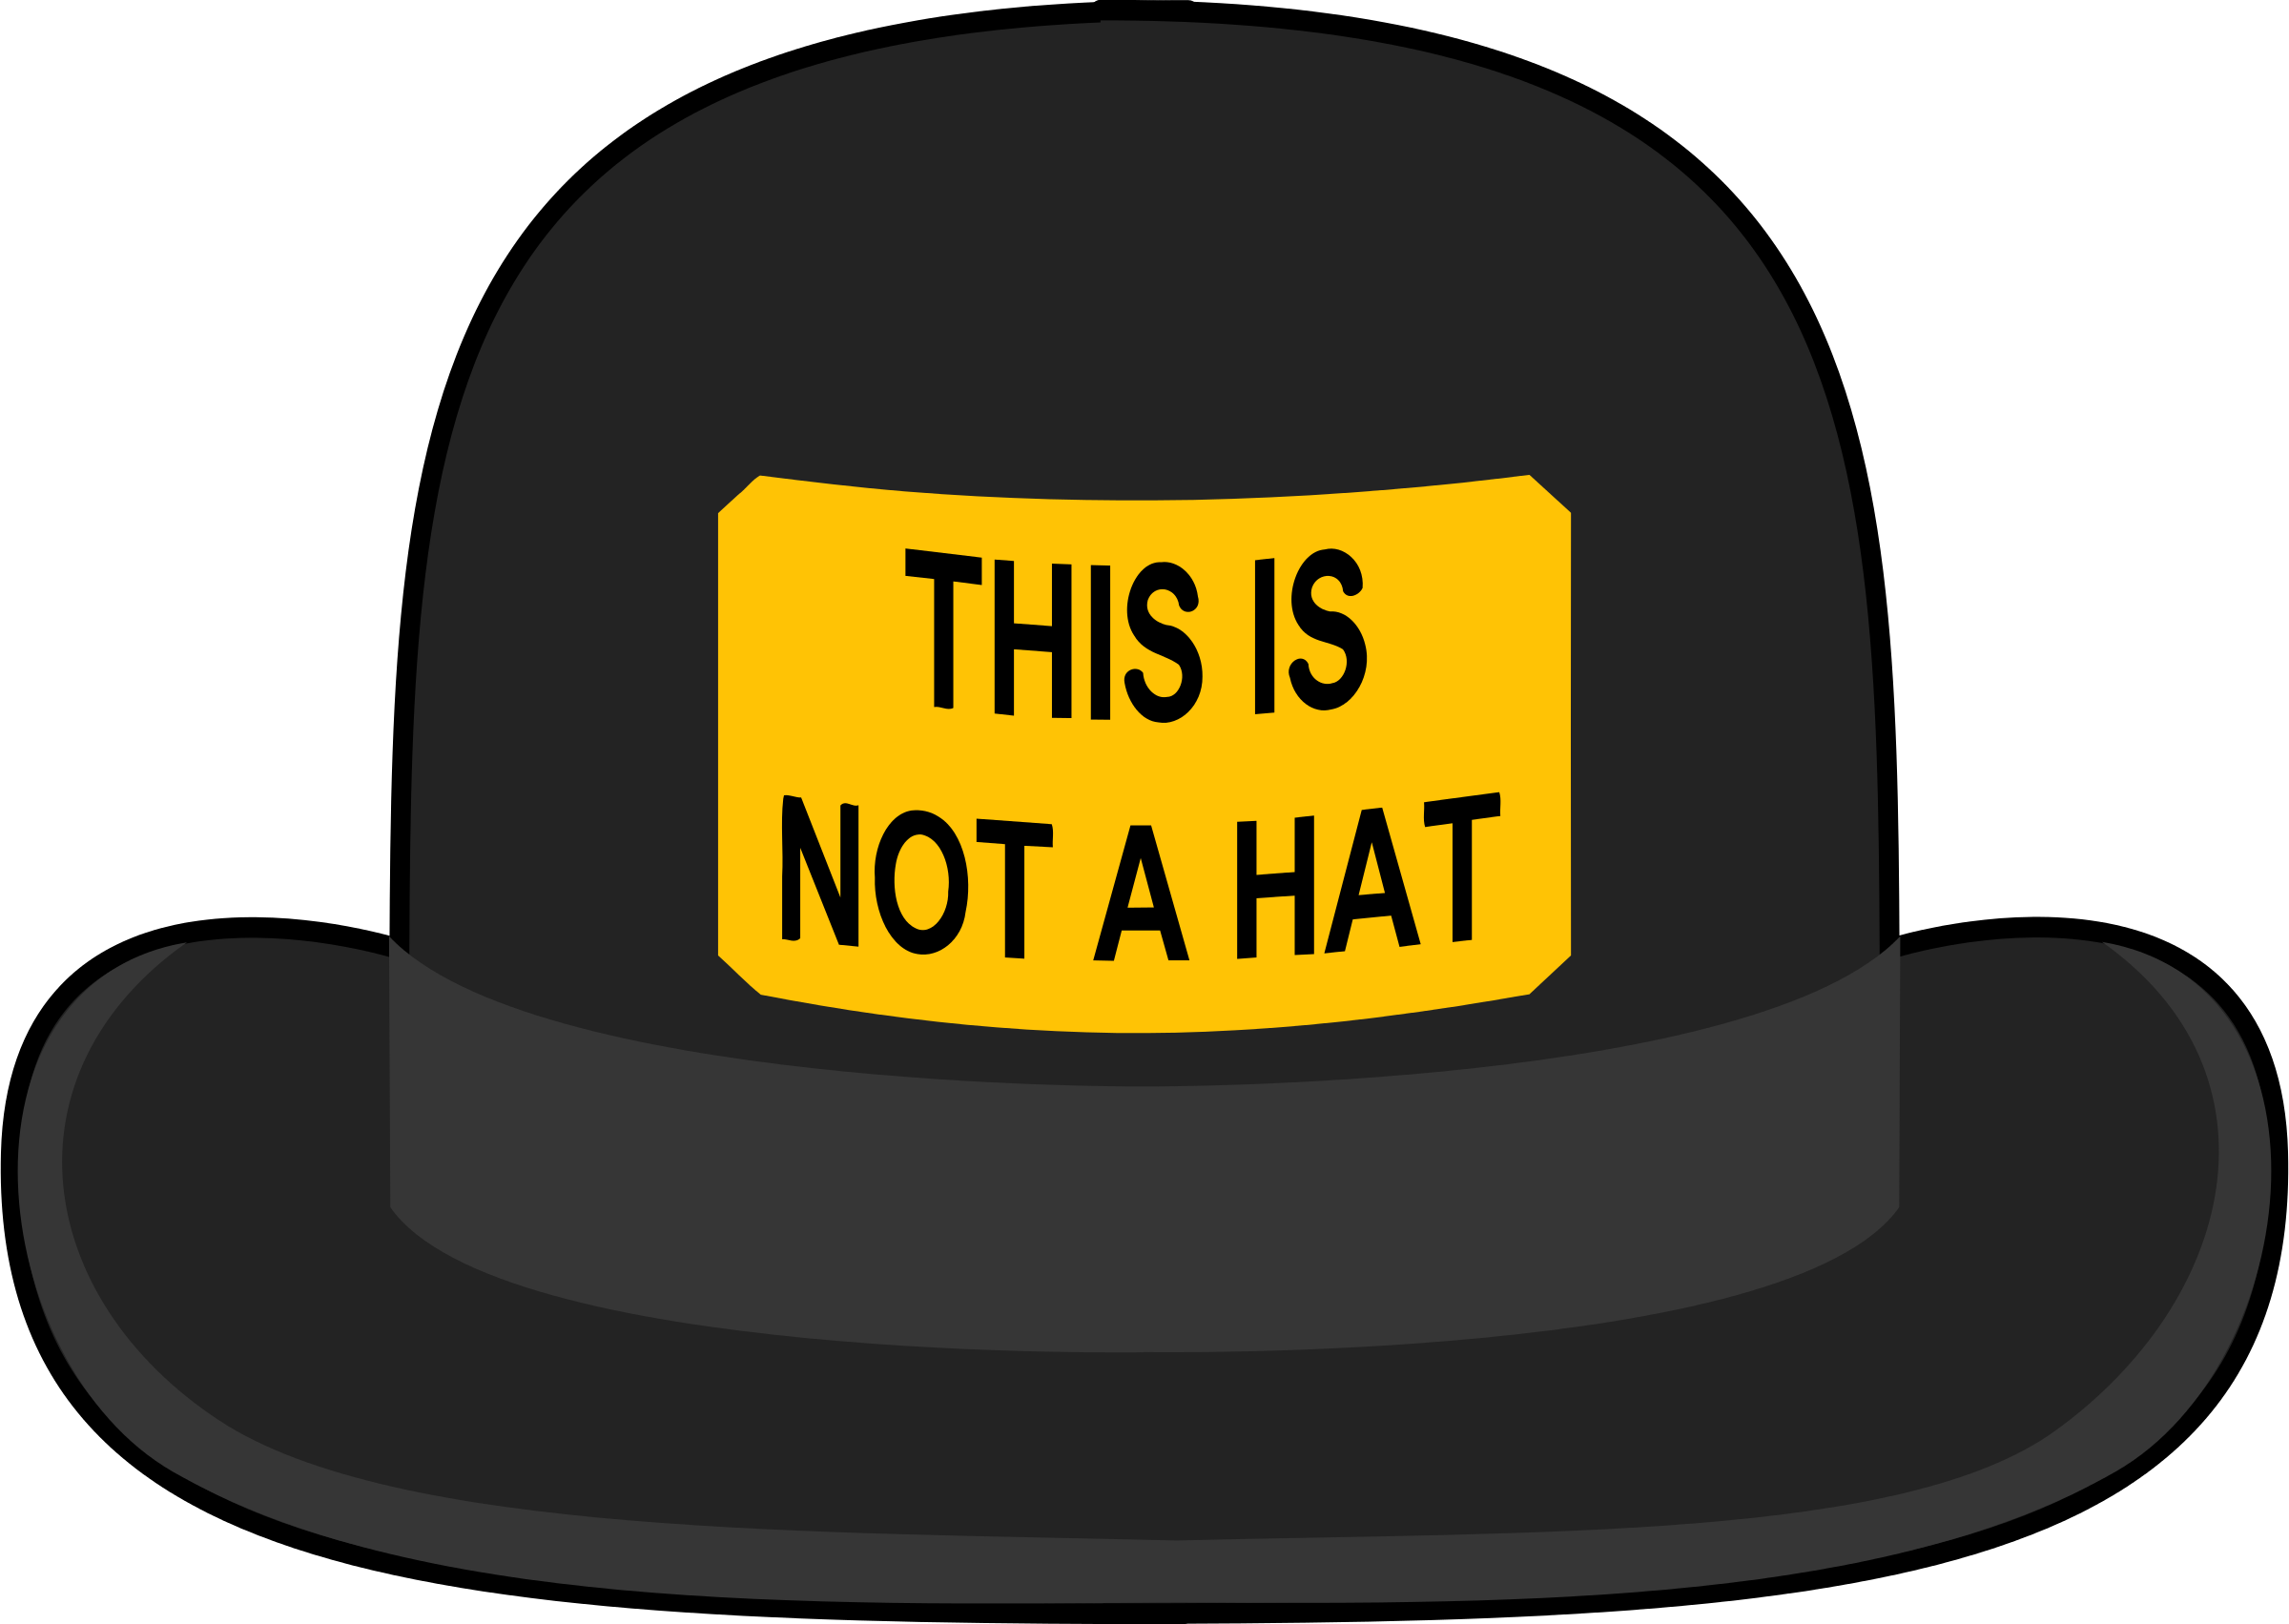 Hats clipart teacher. Free bowler hat images